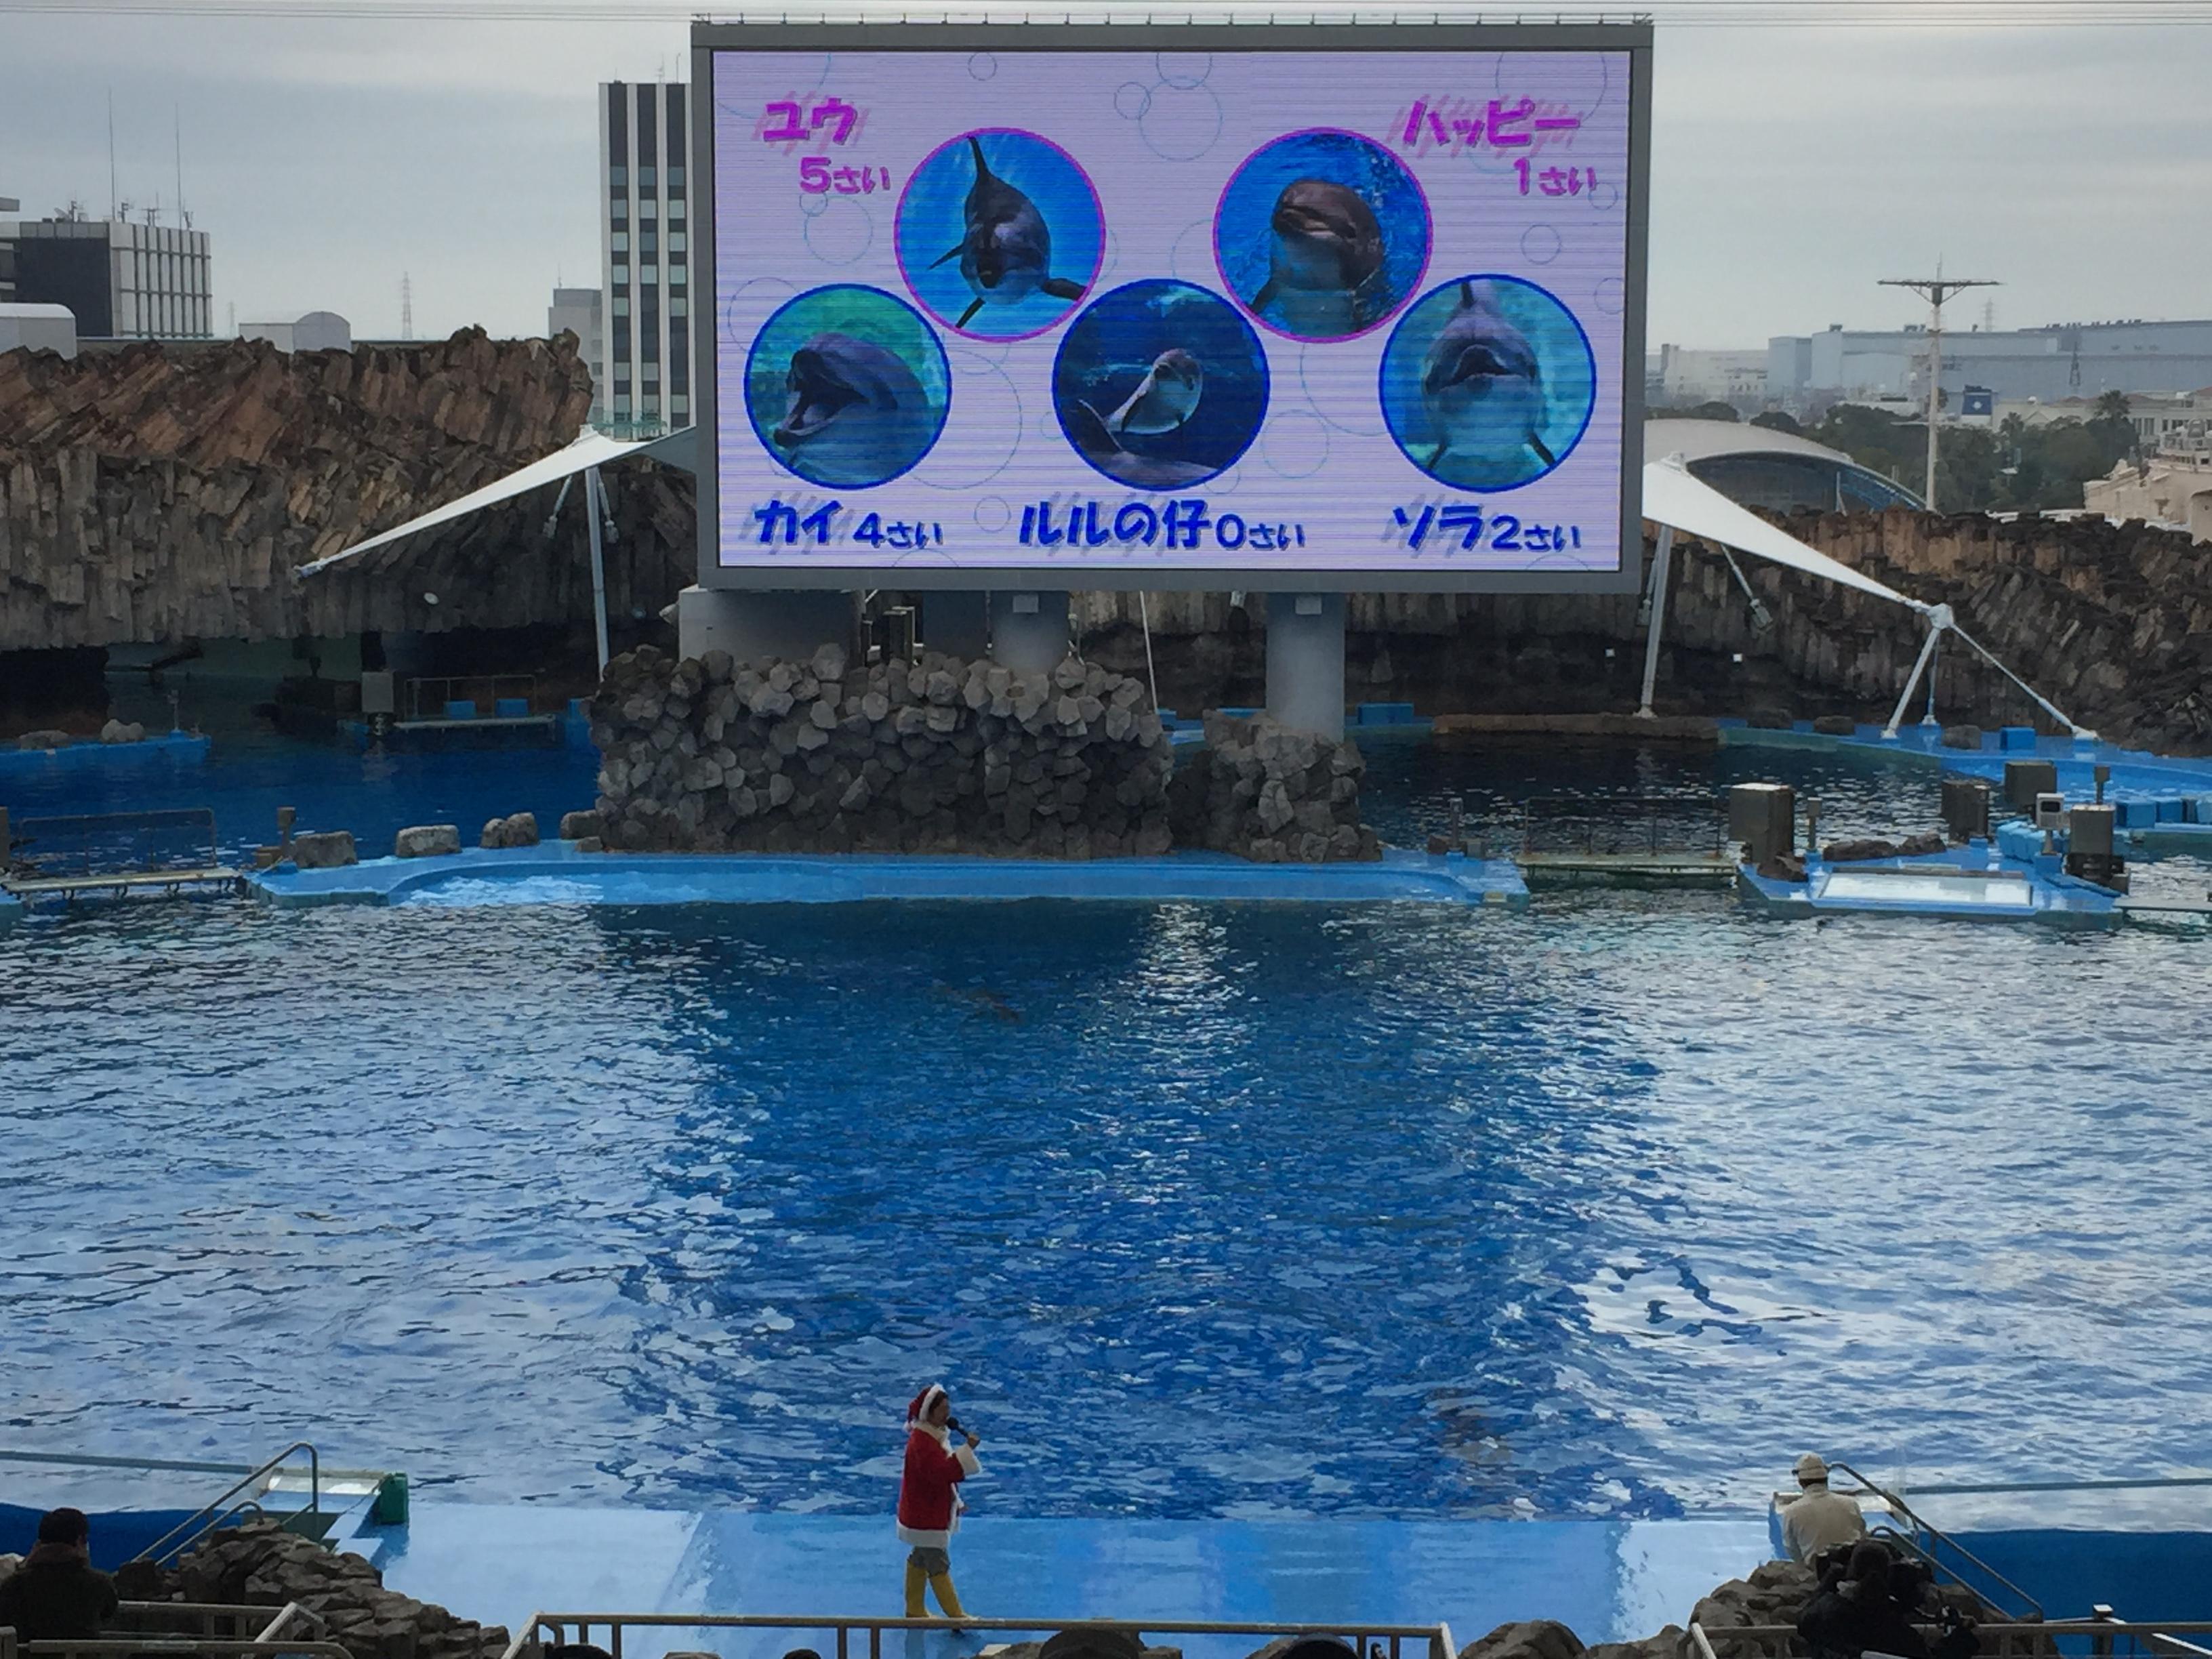 nagoyakou-aquarium-christmas